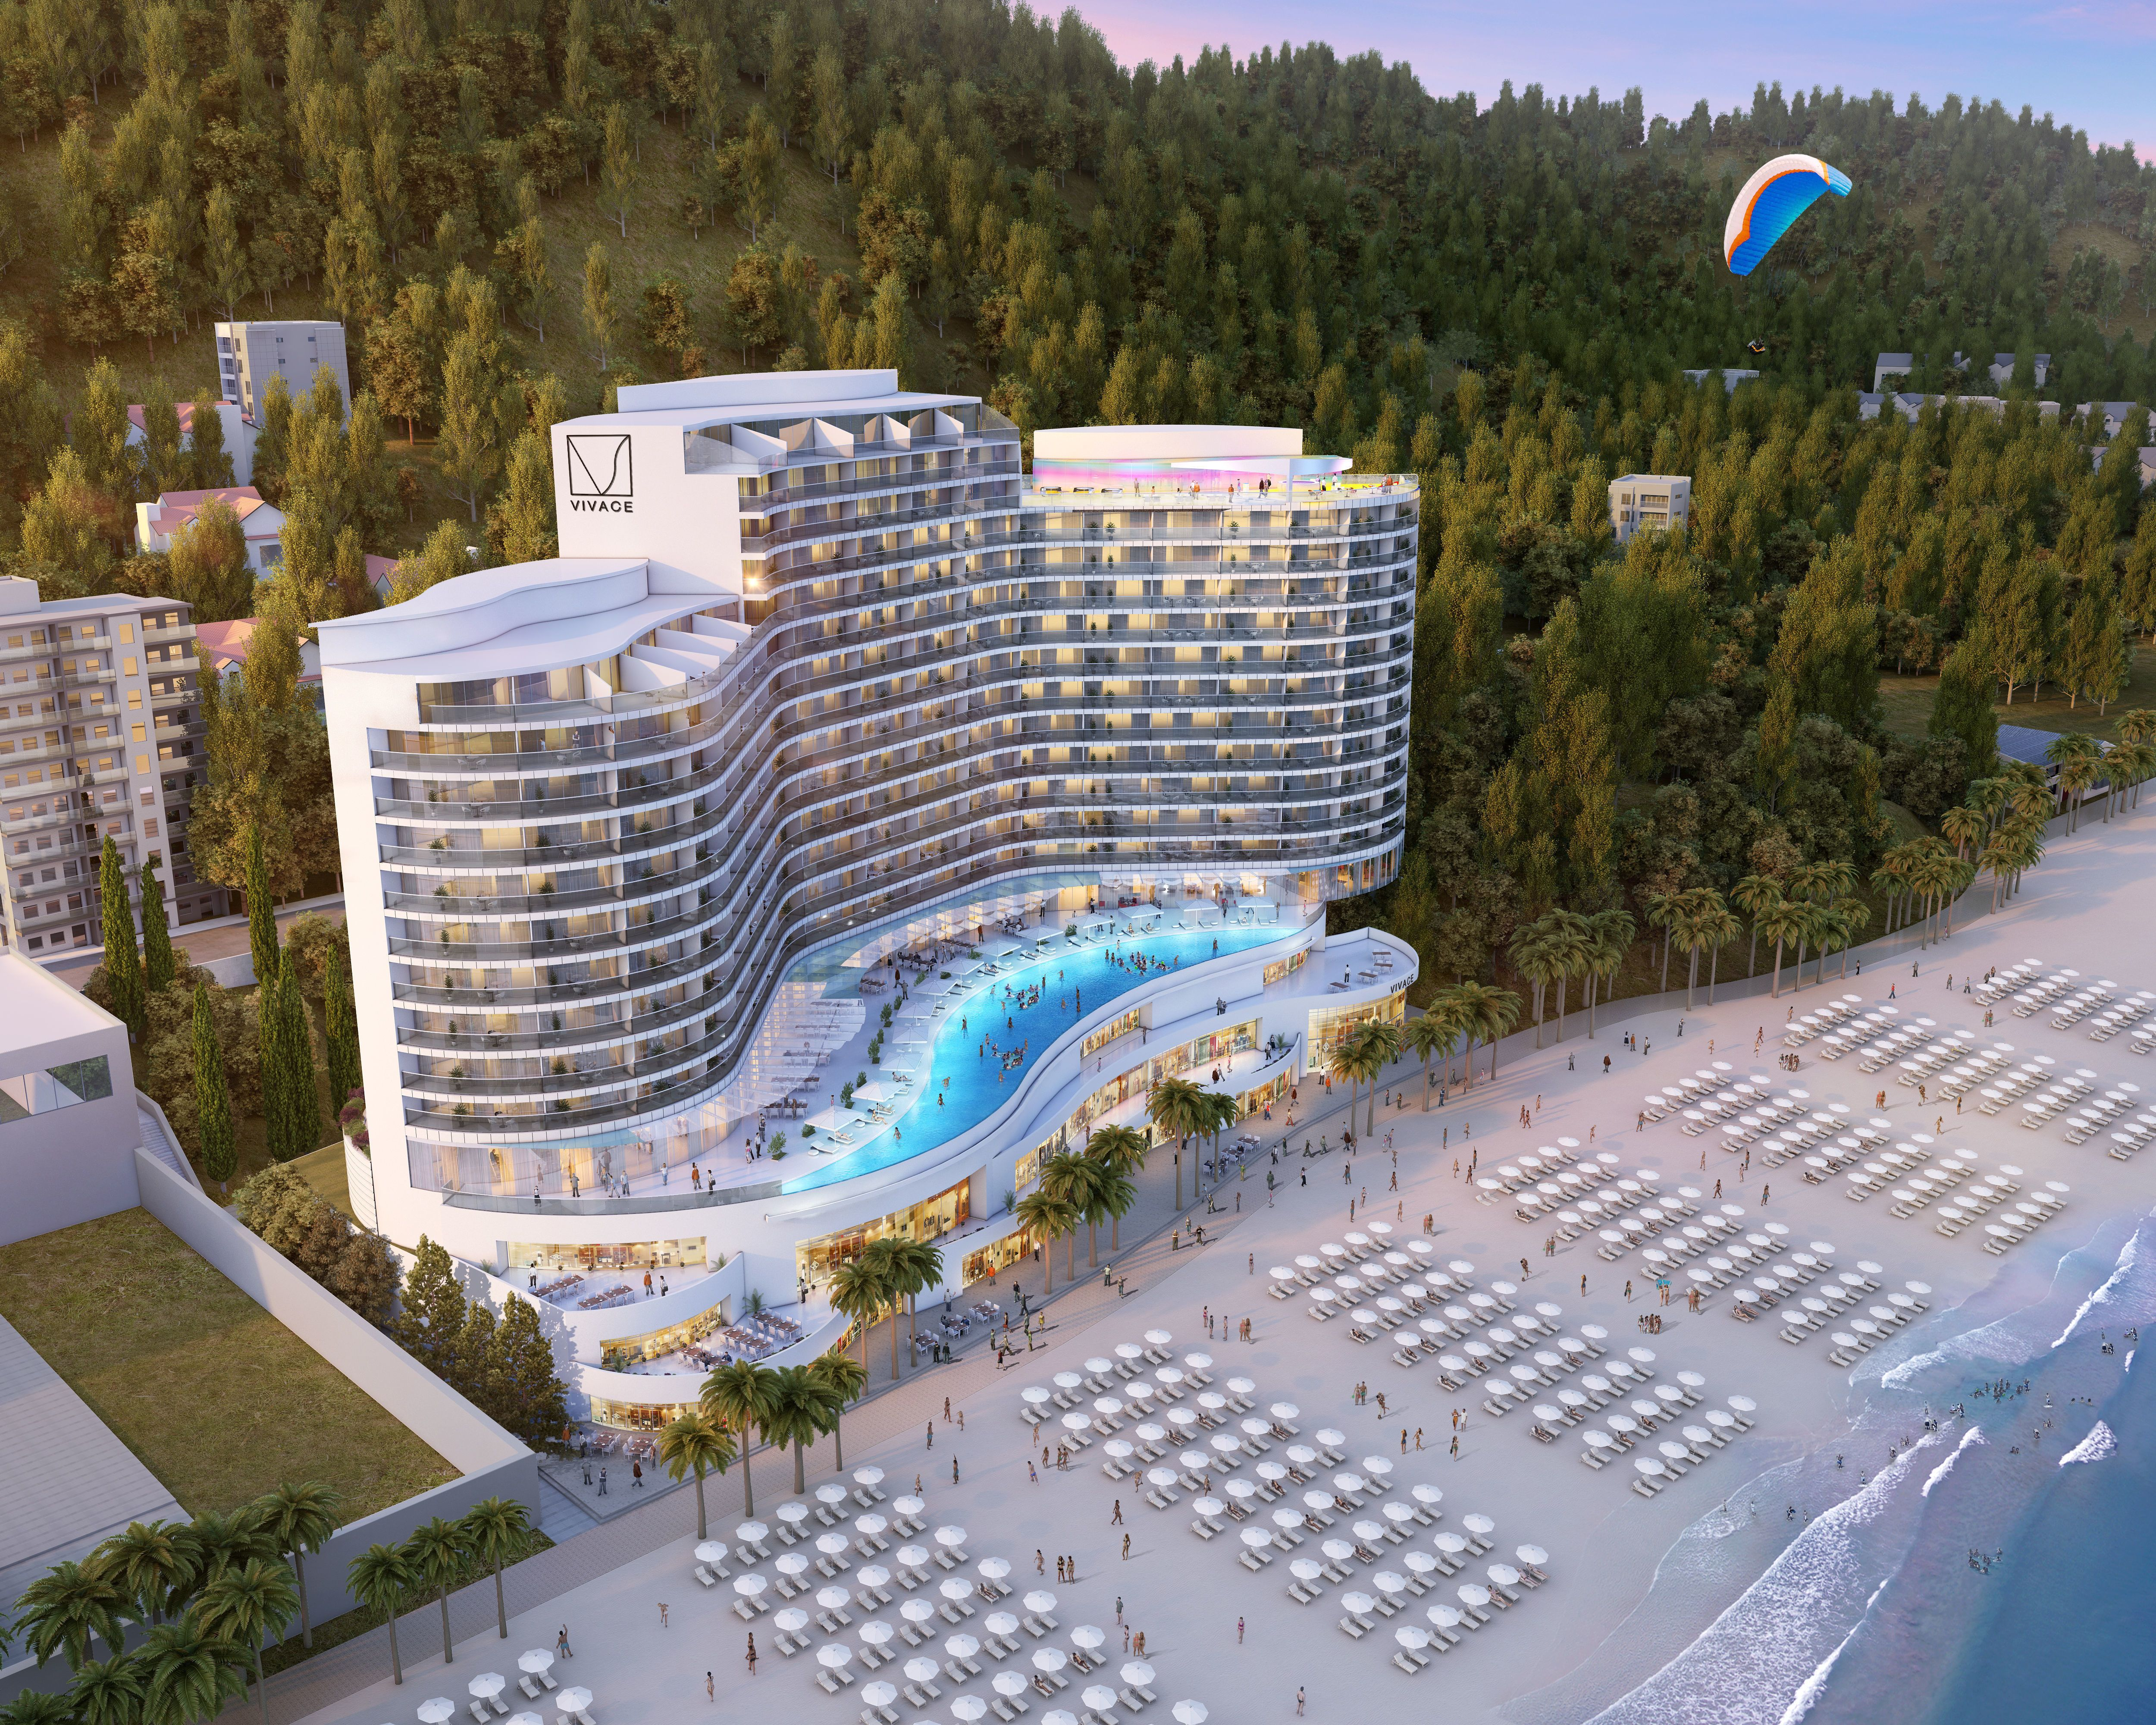 3d Model Hotel 018 Cgtrader Hotel Design Architecture Hotel Architecture Hotel Concept